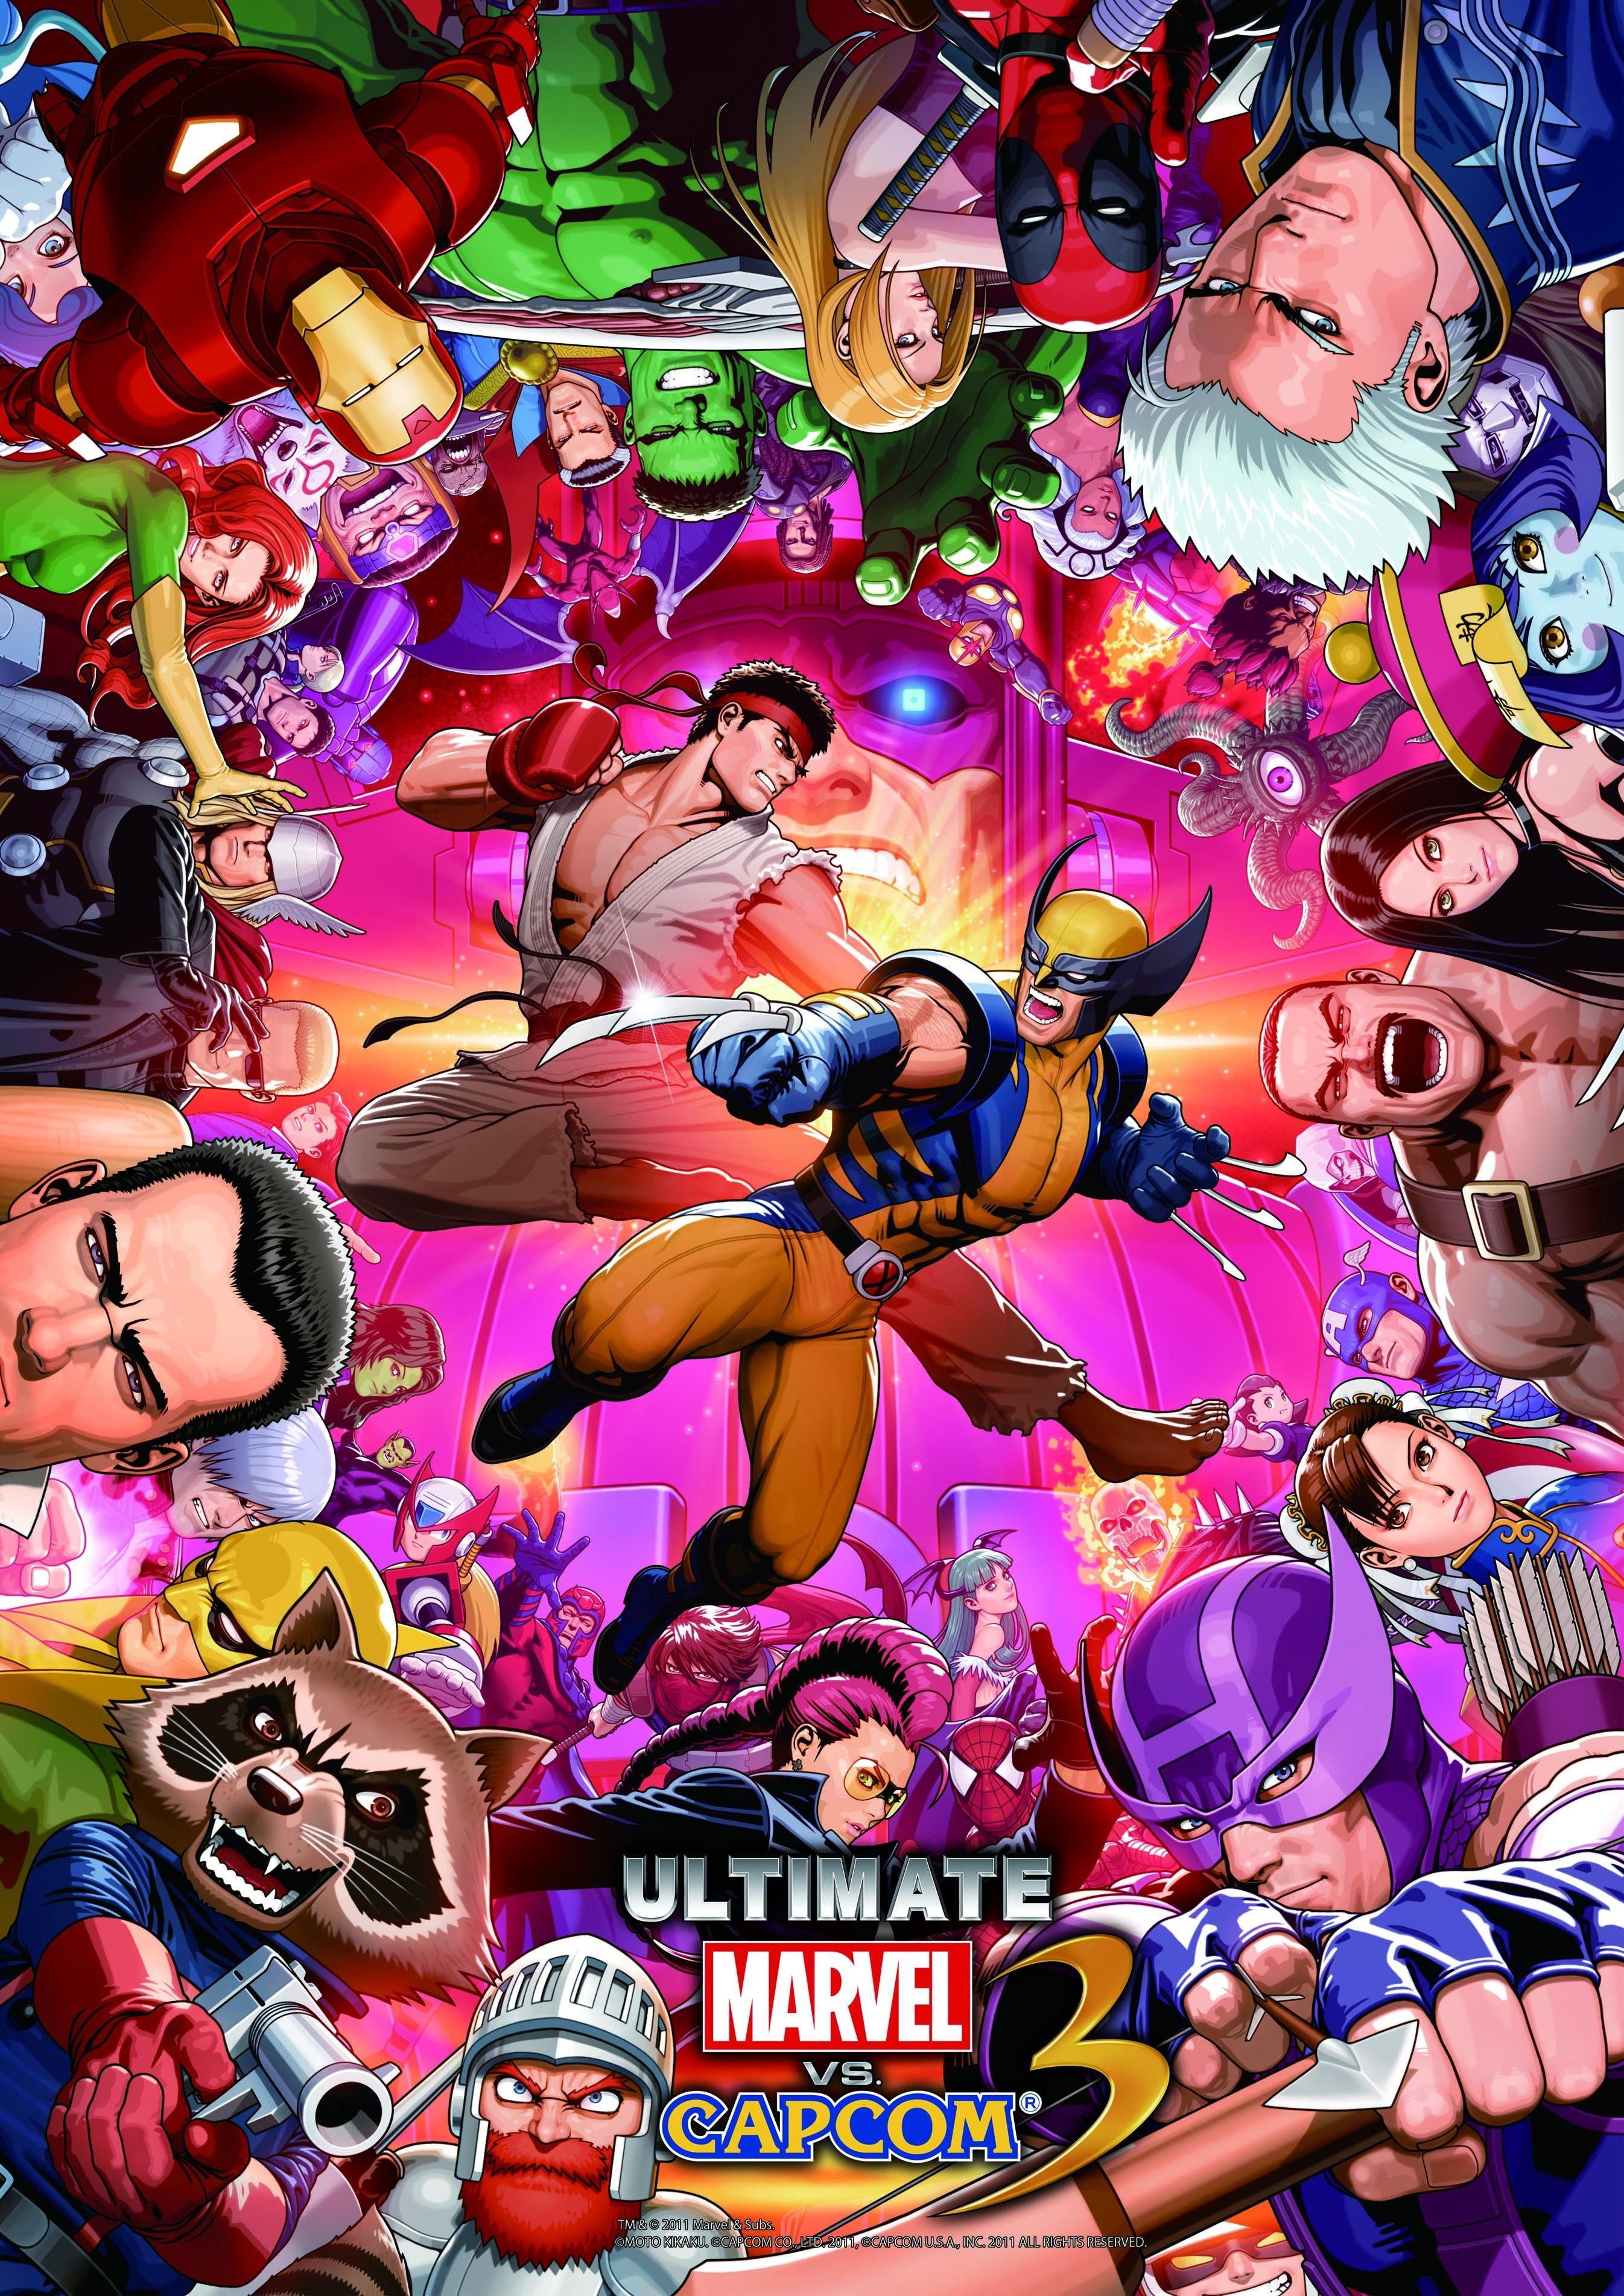 Pin By Chupi Chug Chavez On Heros Marvel Vs Capcom Capcom Art Marvel Vs